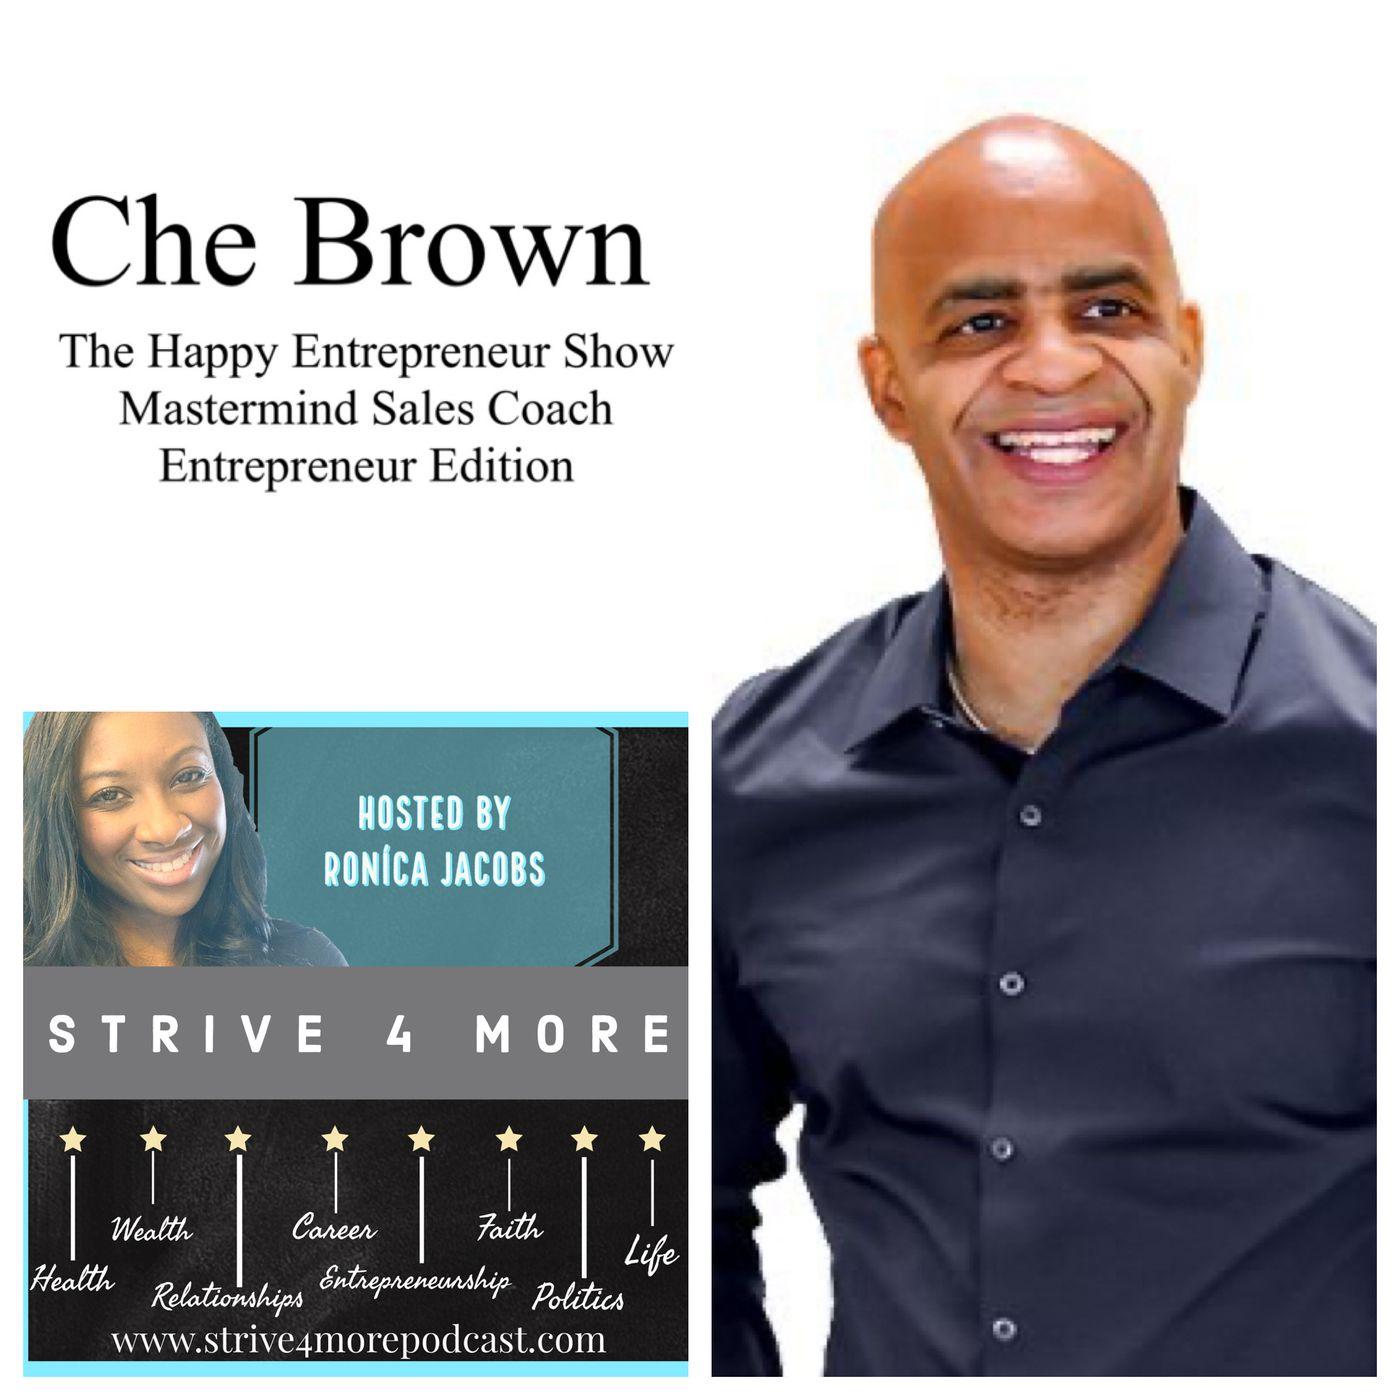 Entrepreneur Edition- Next Level Thinking Makes An Entrepreneur